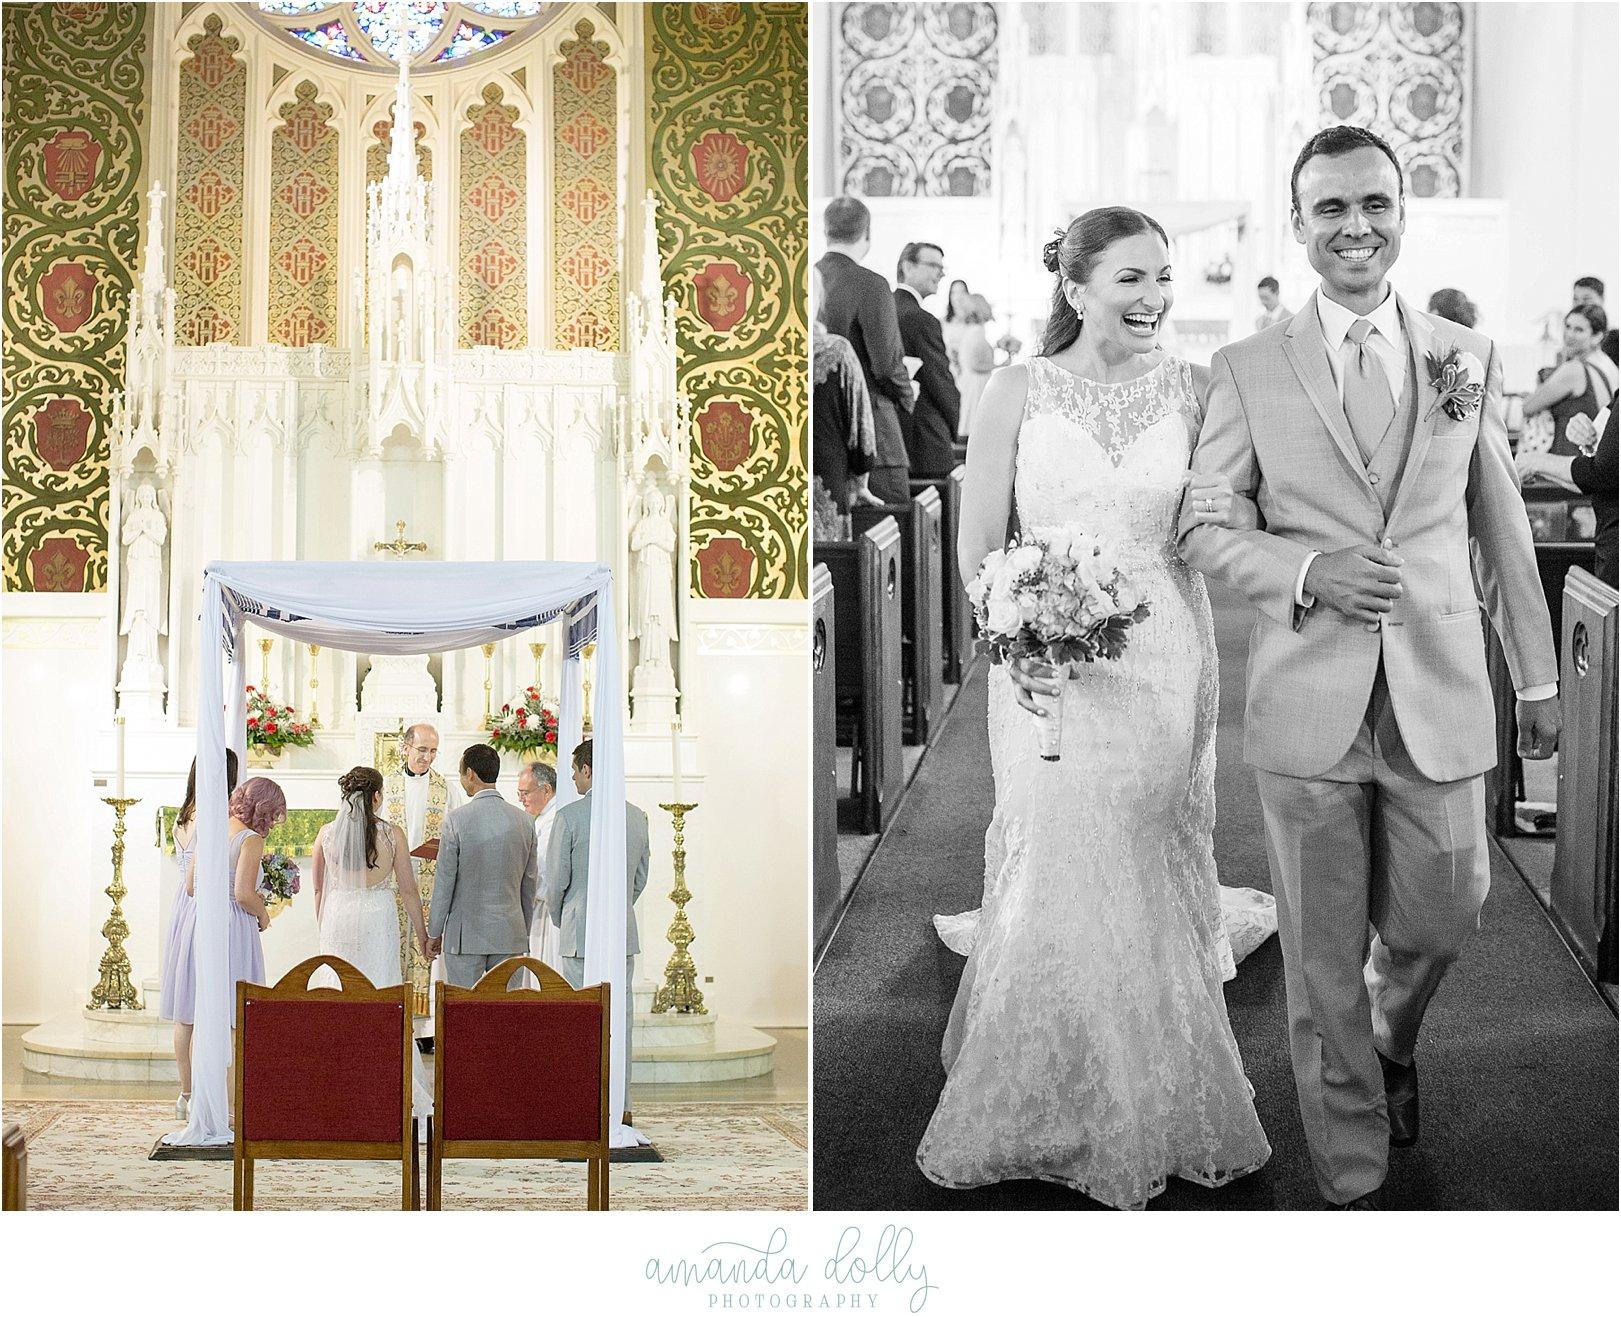 McLoone's Wedding Photography